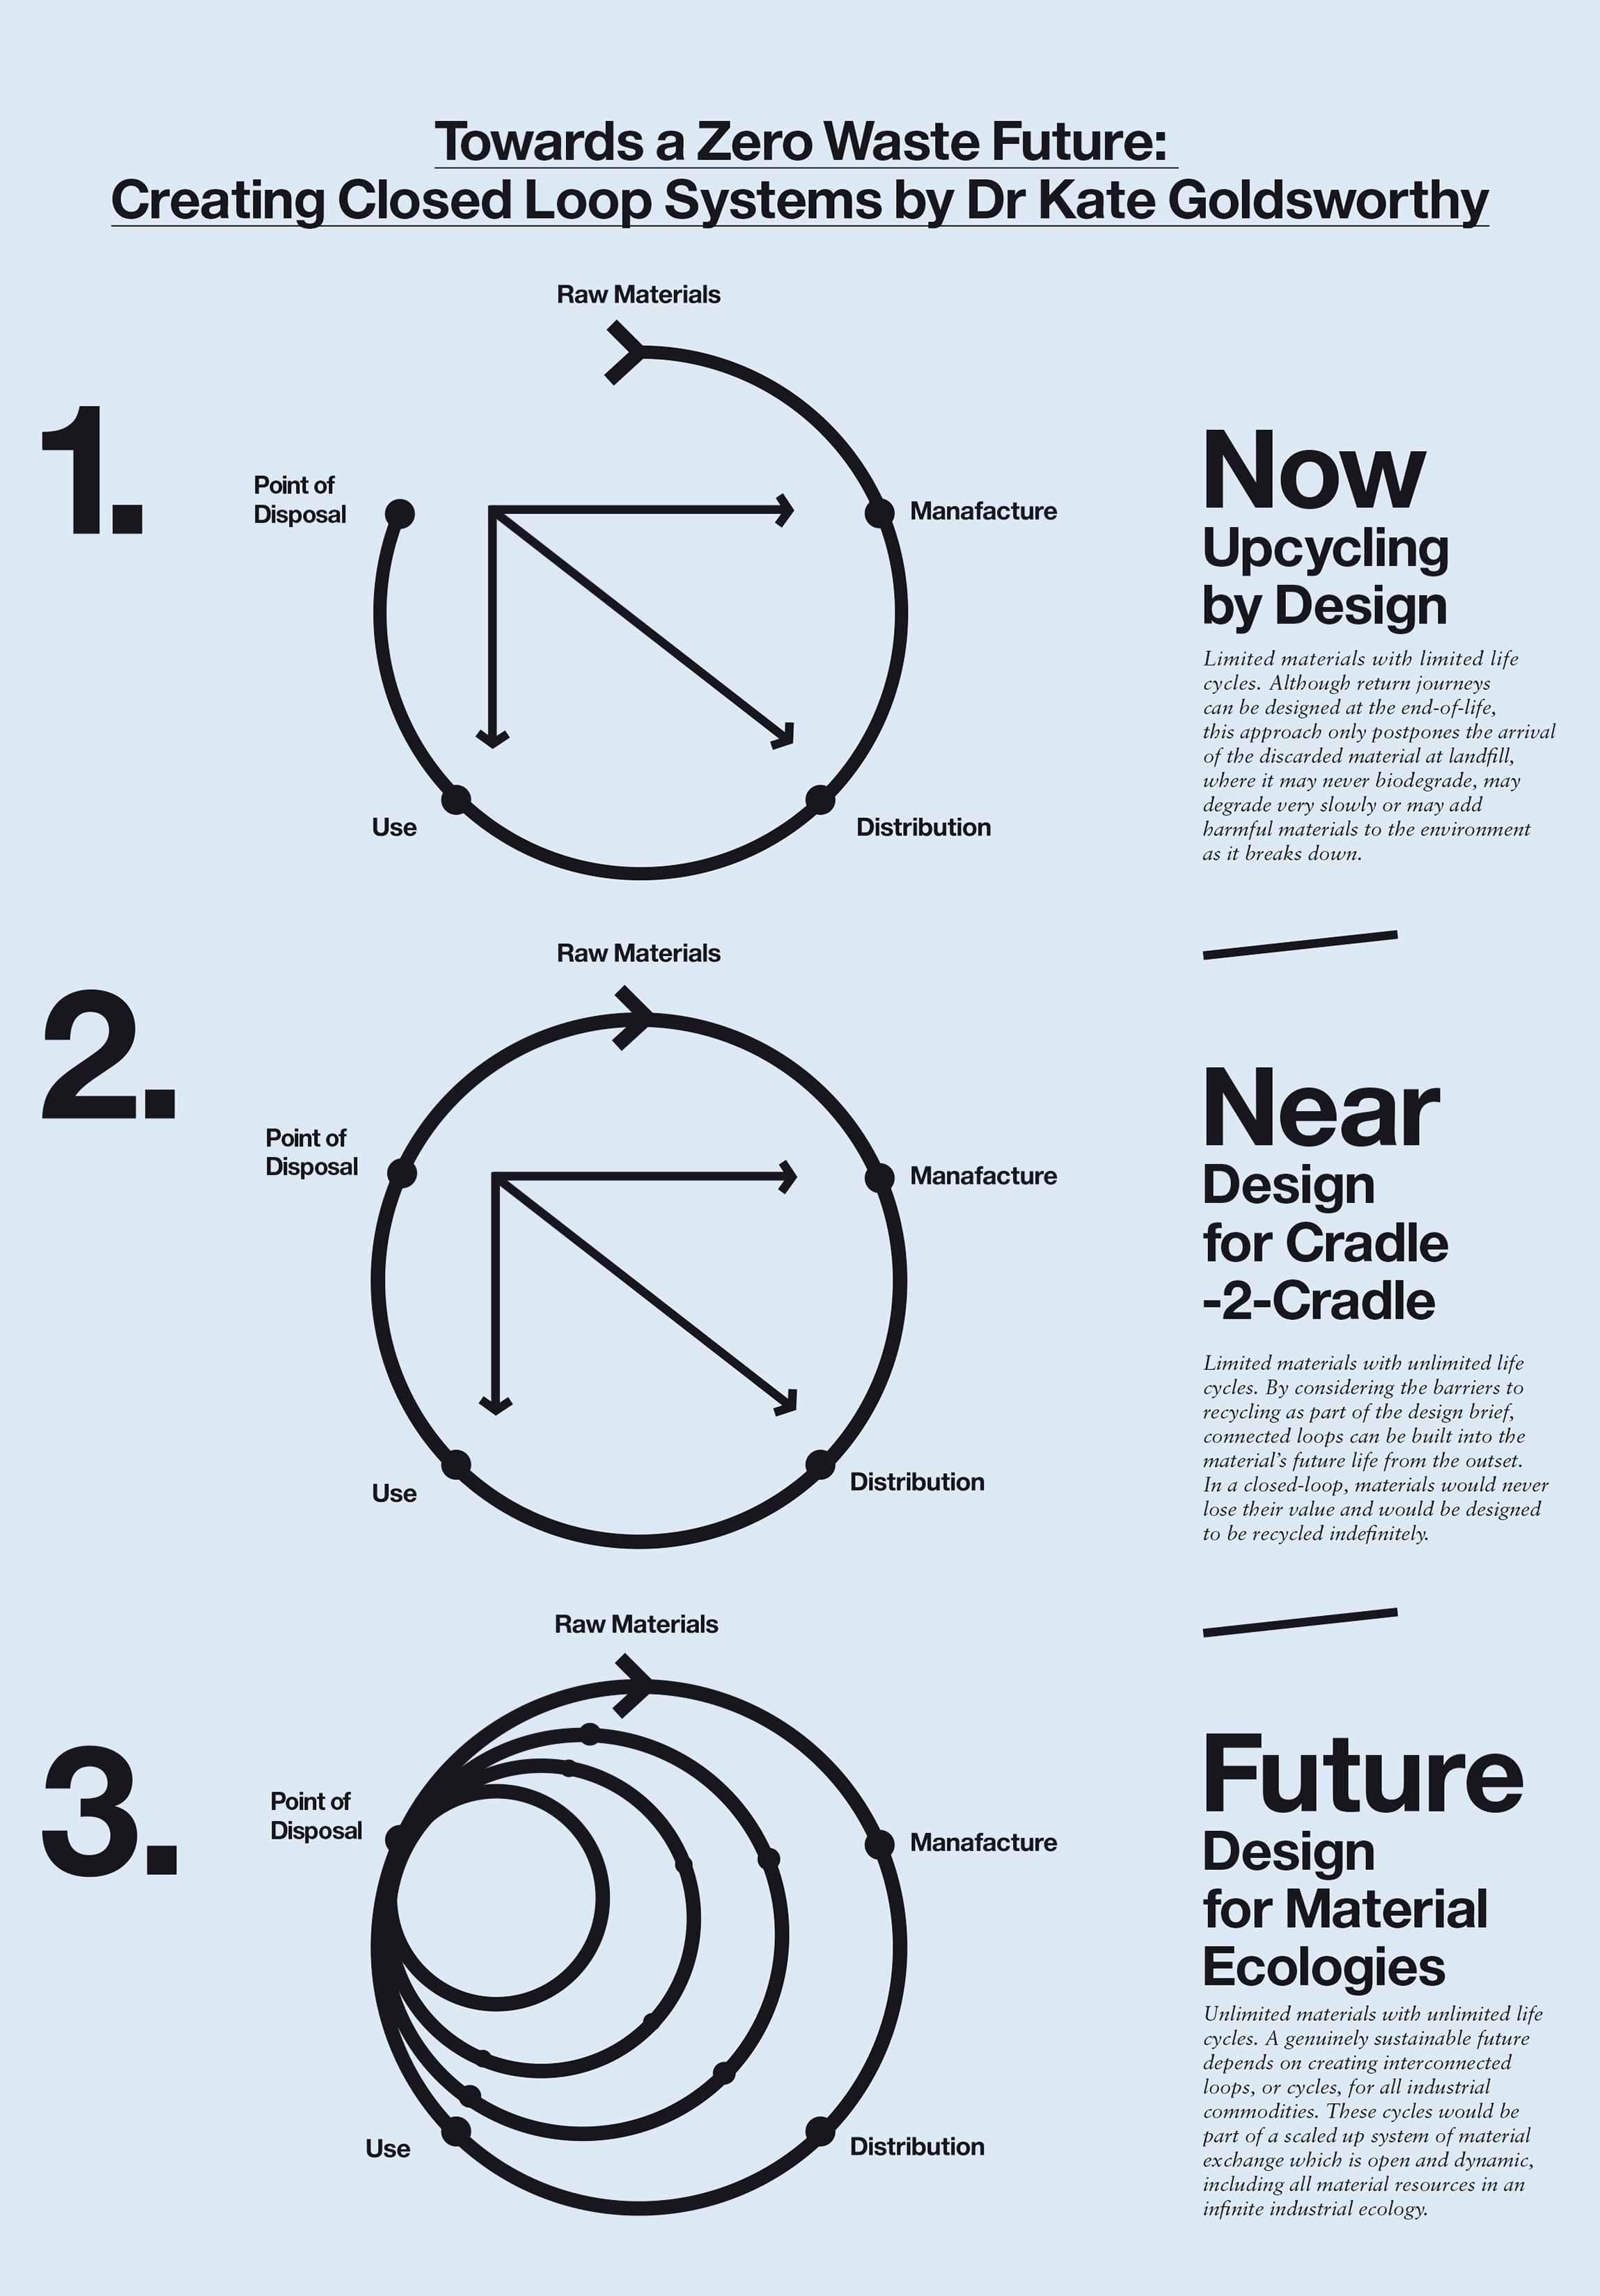 Design for Cyclability - Goldsworthy (2012)